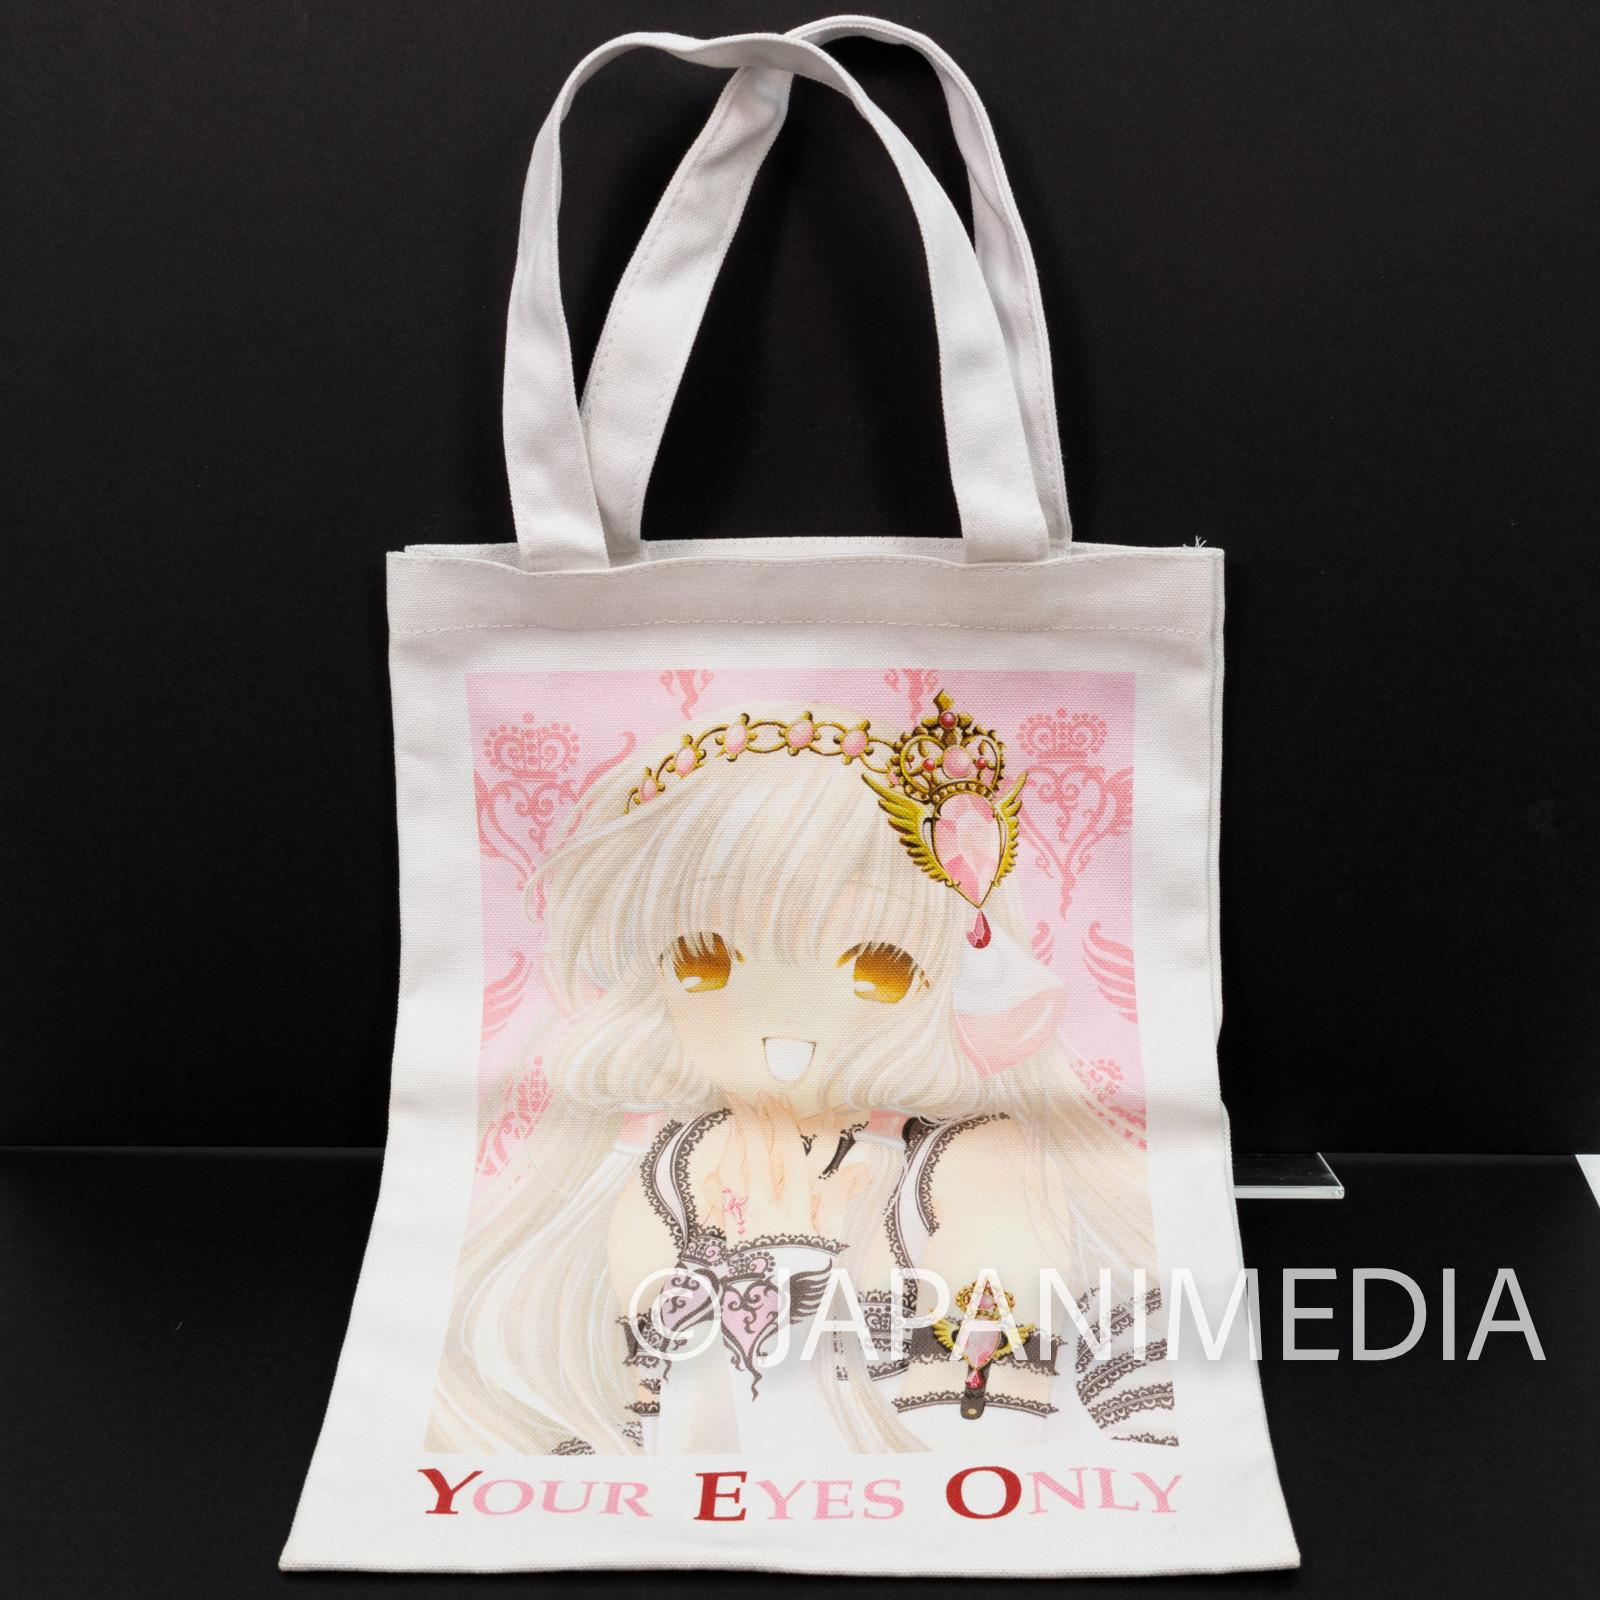 Chobits Elda Chii Small Cloth Tote Bag 10x8 inch JAPAN ANIME